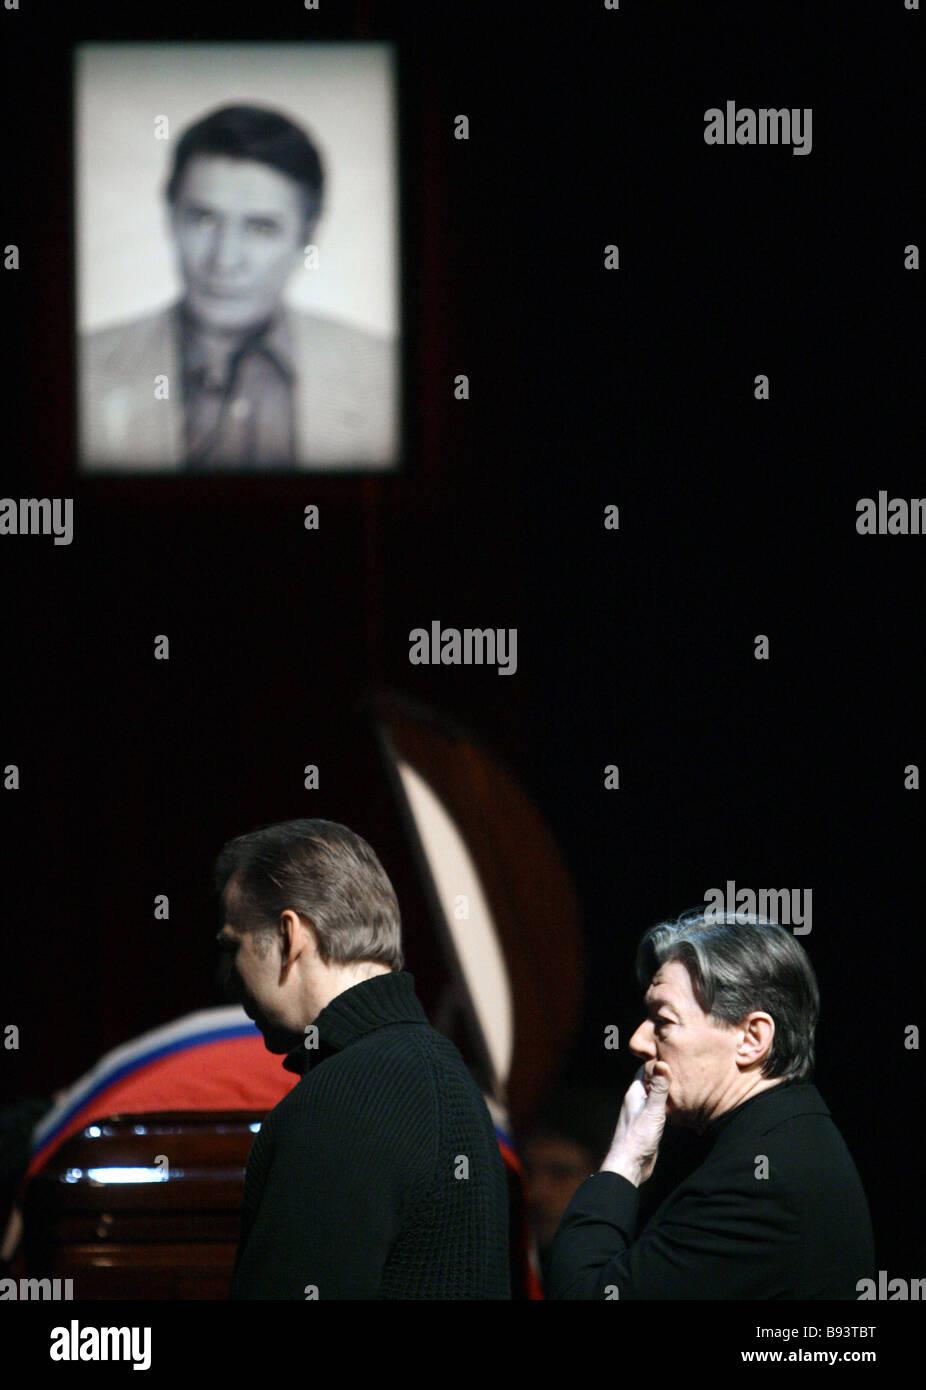 The tragedy of Alexander Zbruyev 07/08/2009 60